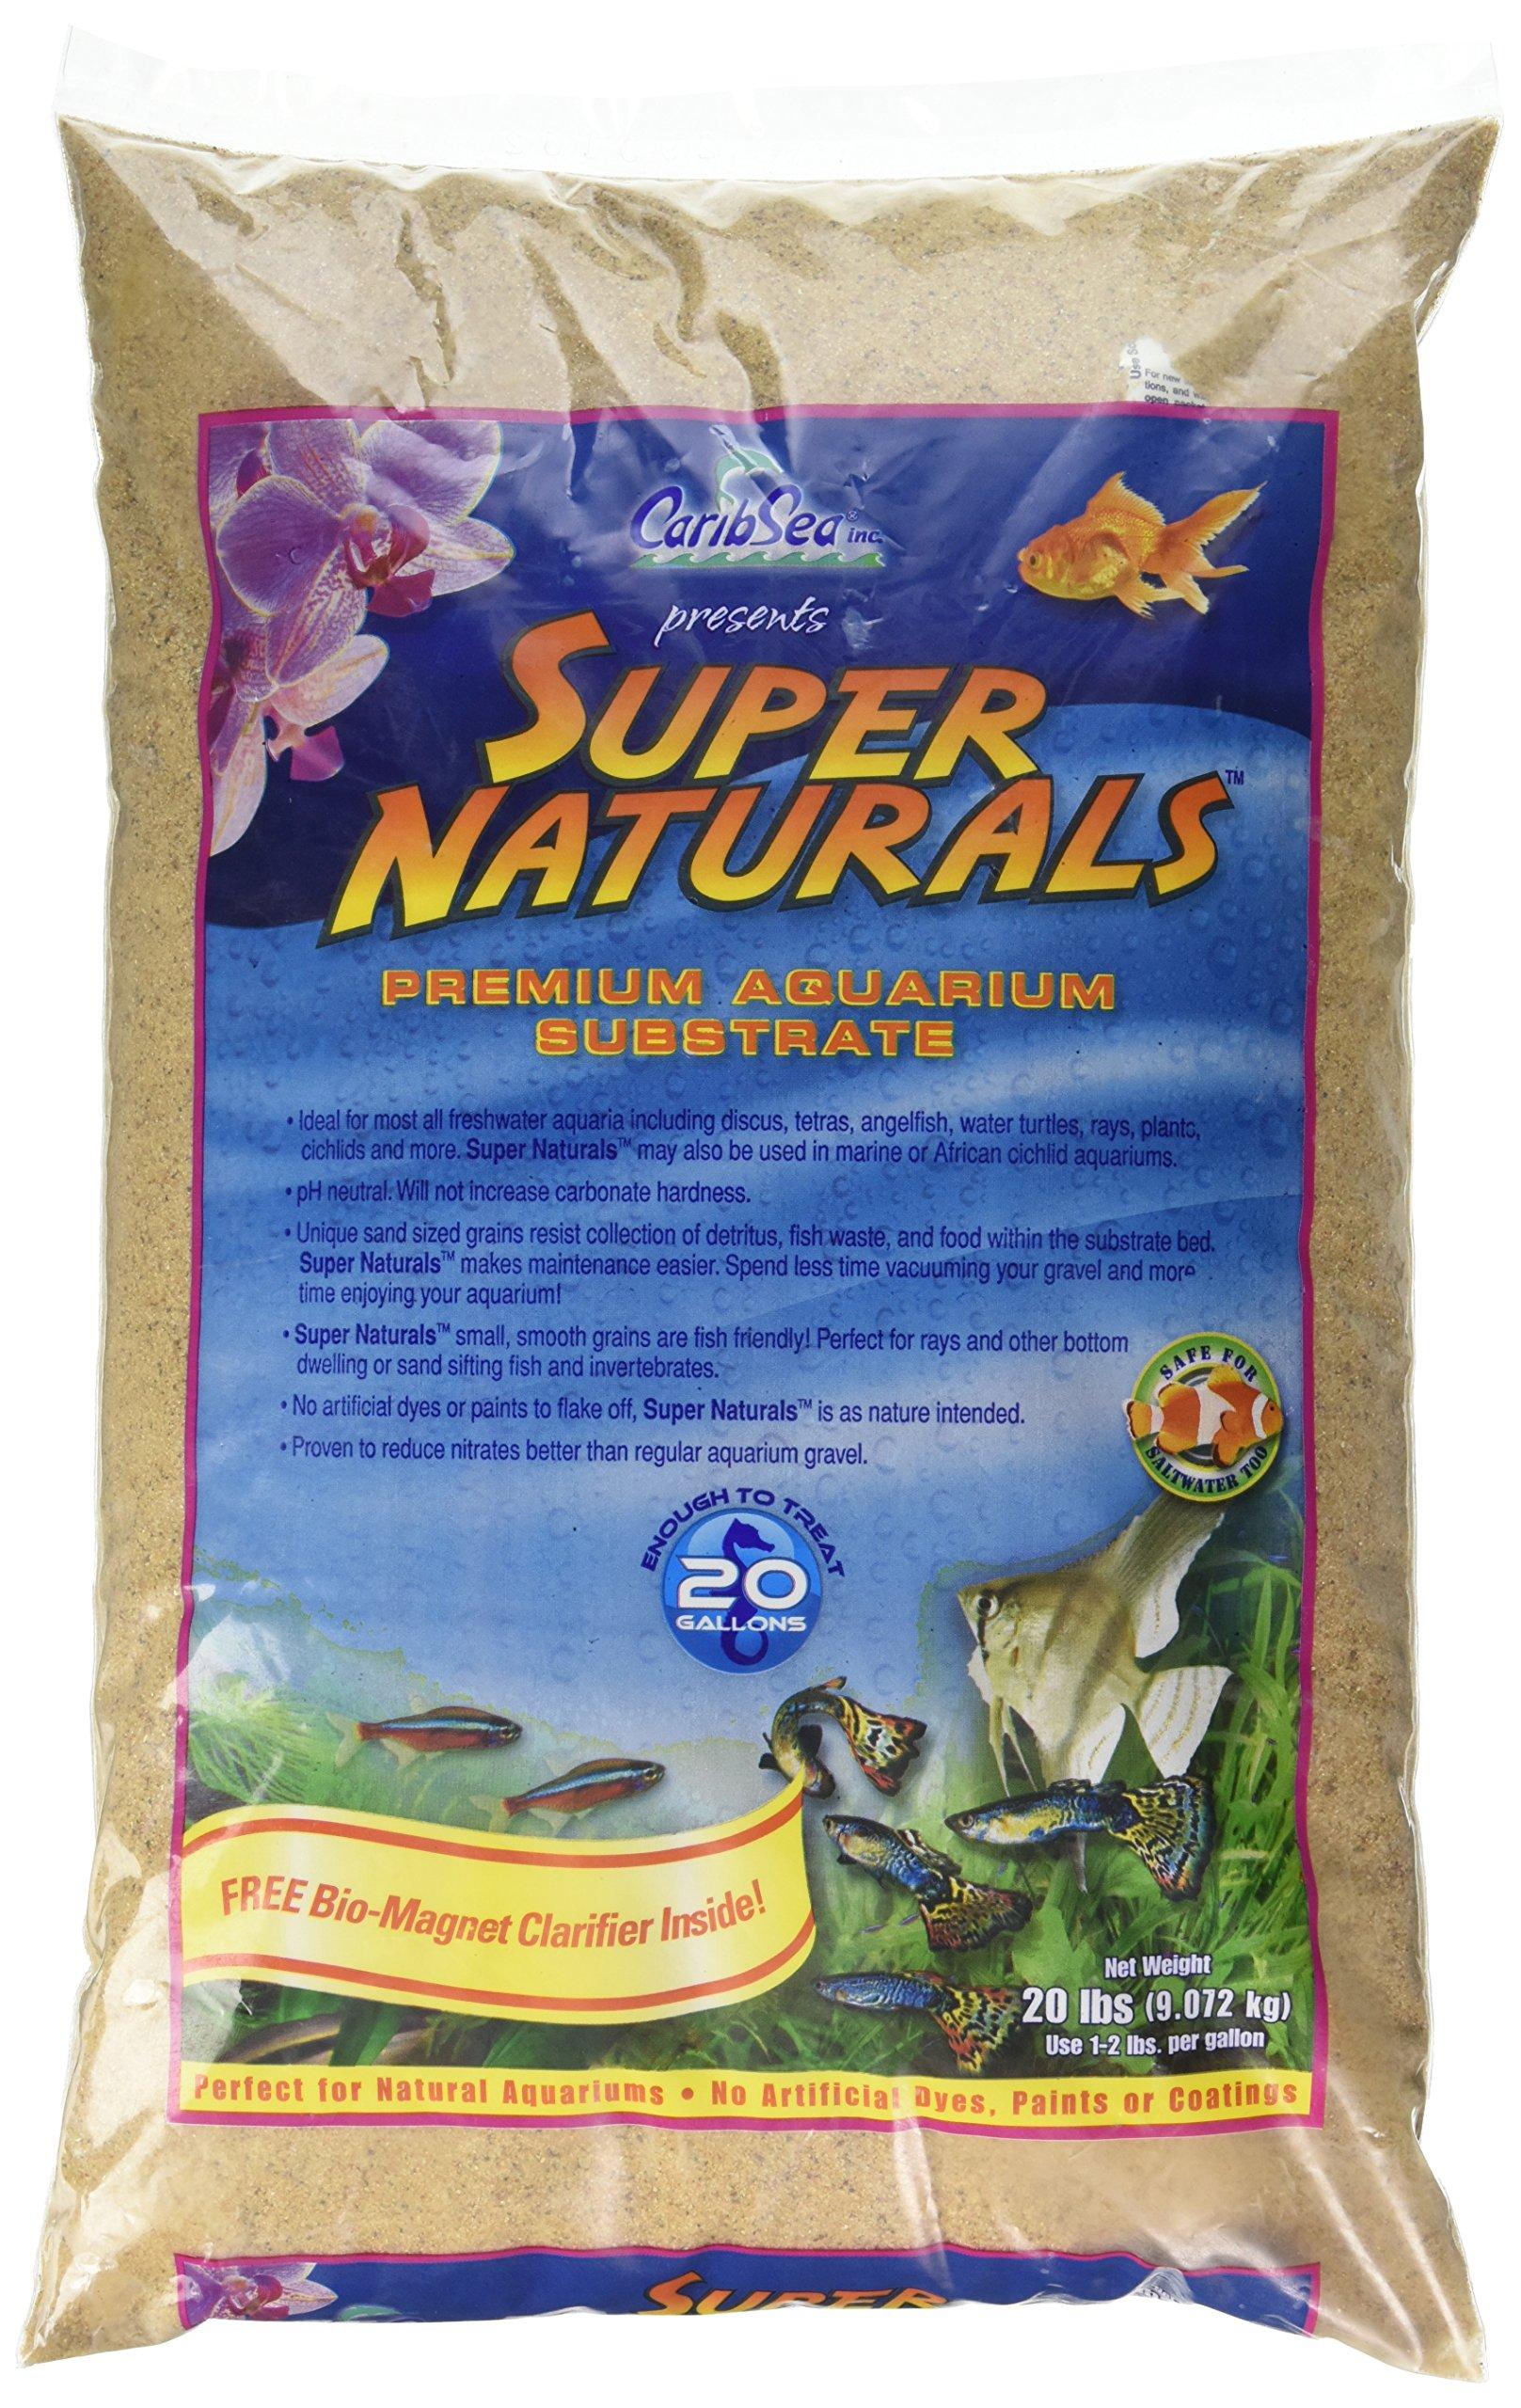 Caribsea Super Naturals Aquarium Sand, 20-Pound, Sunset Gold by Carib Sea (Image #1)